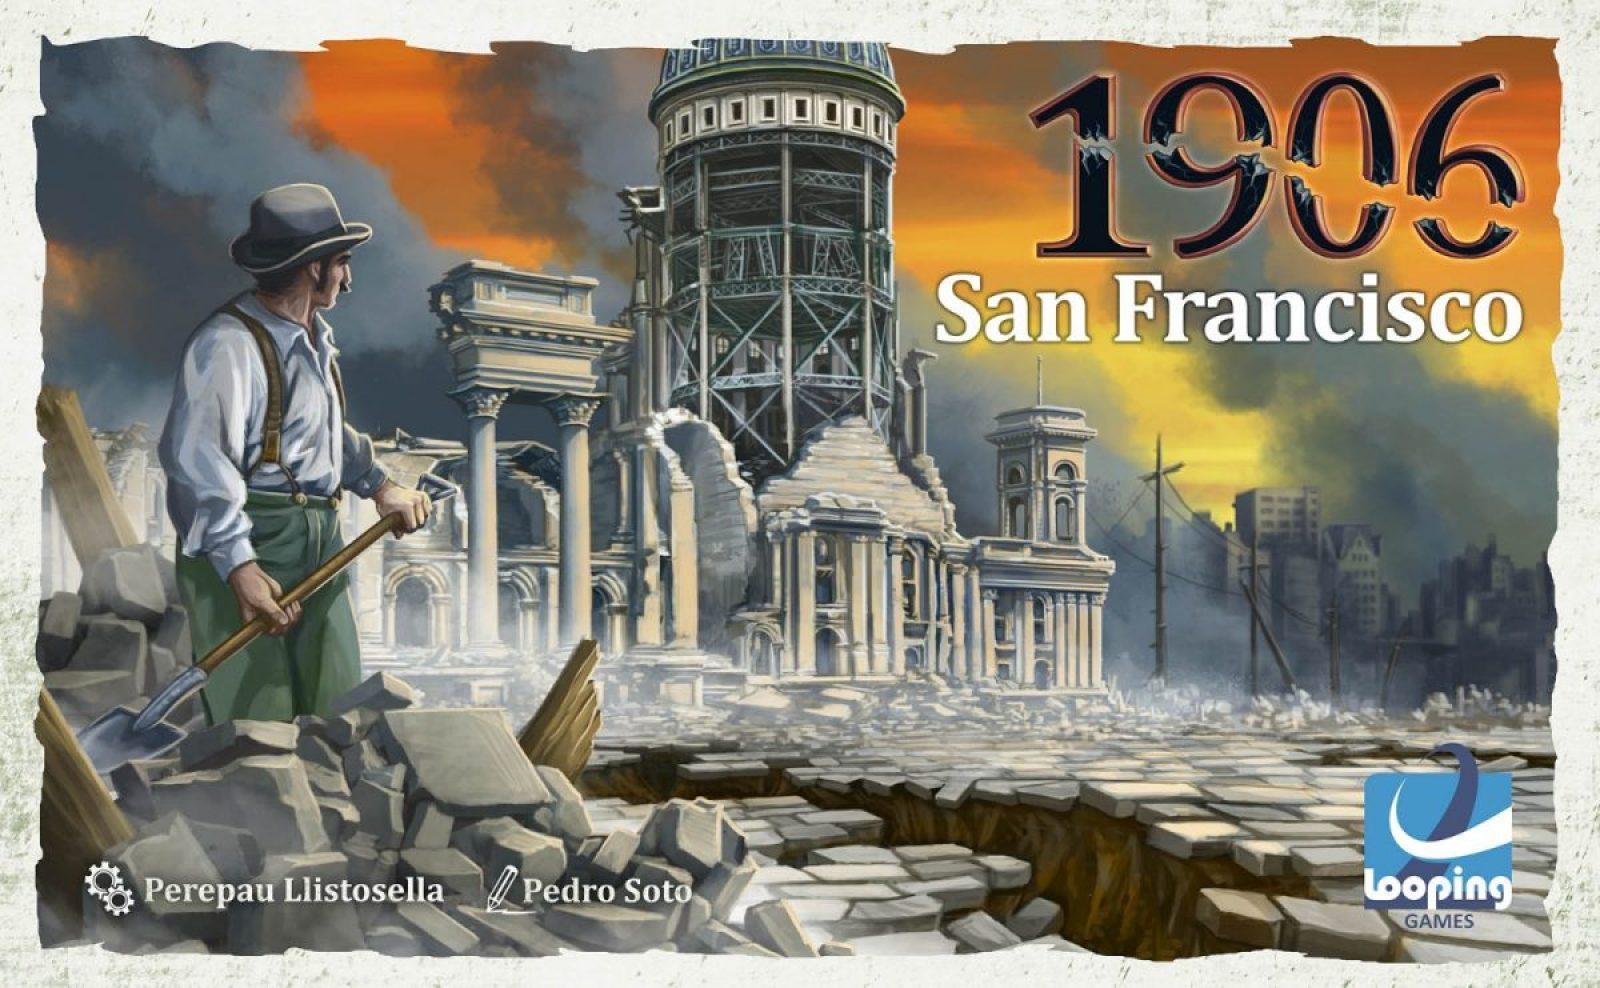 1906 san francisco juego de mesa